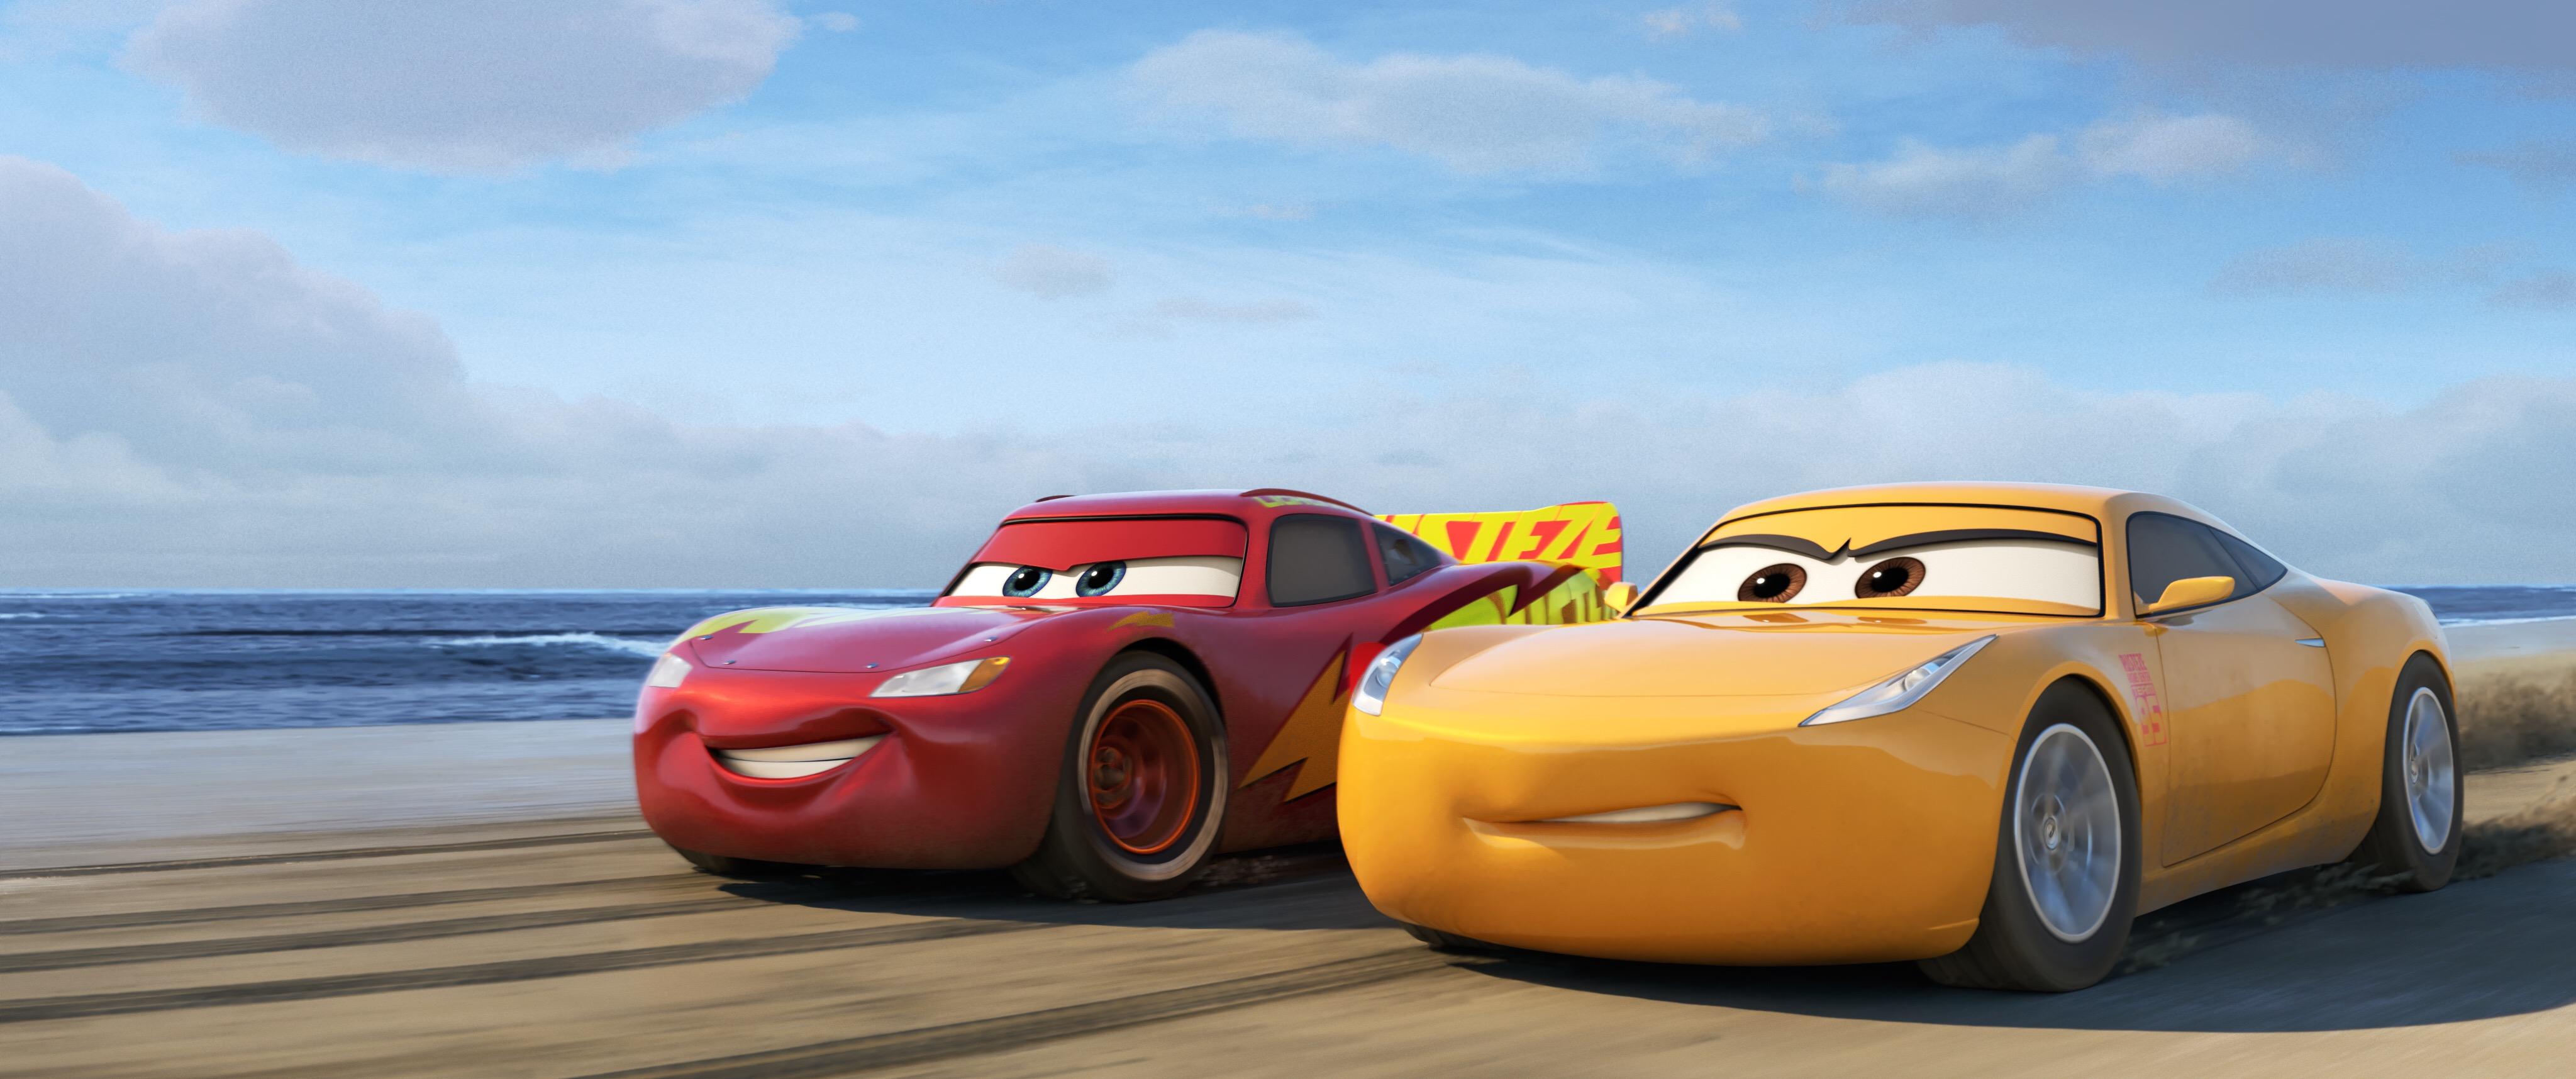 Nascar Racers Join Voice Cast Of Pixar S Cars Animation